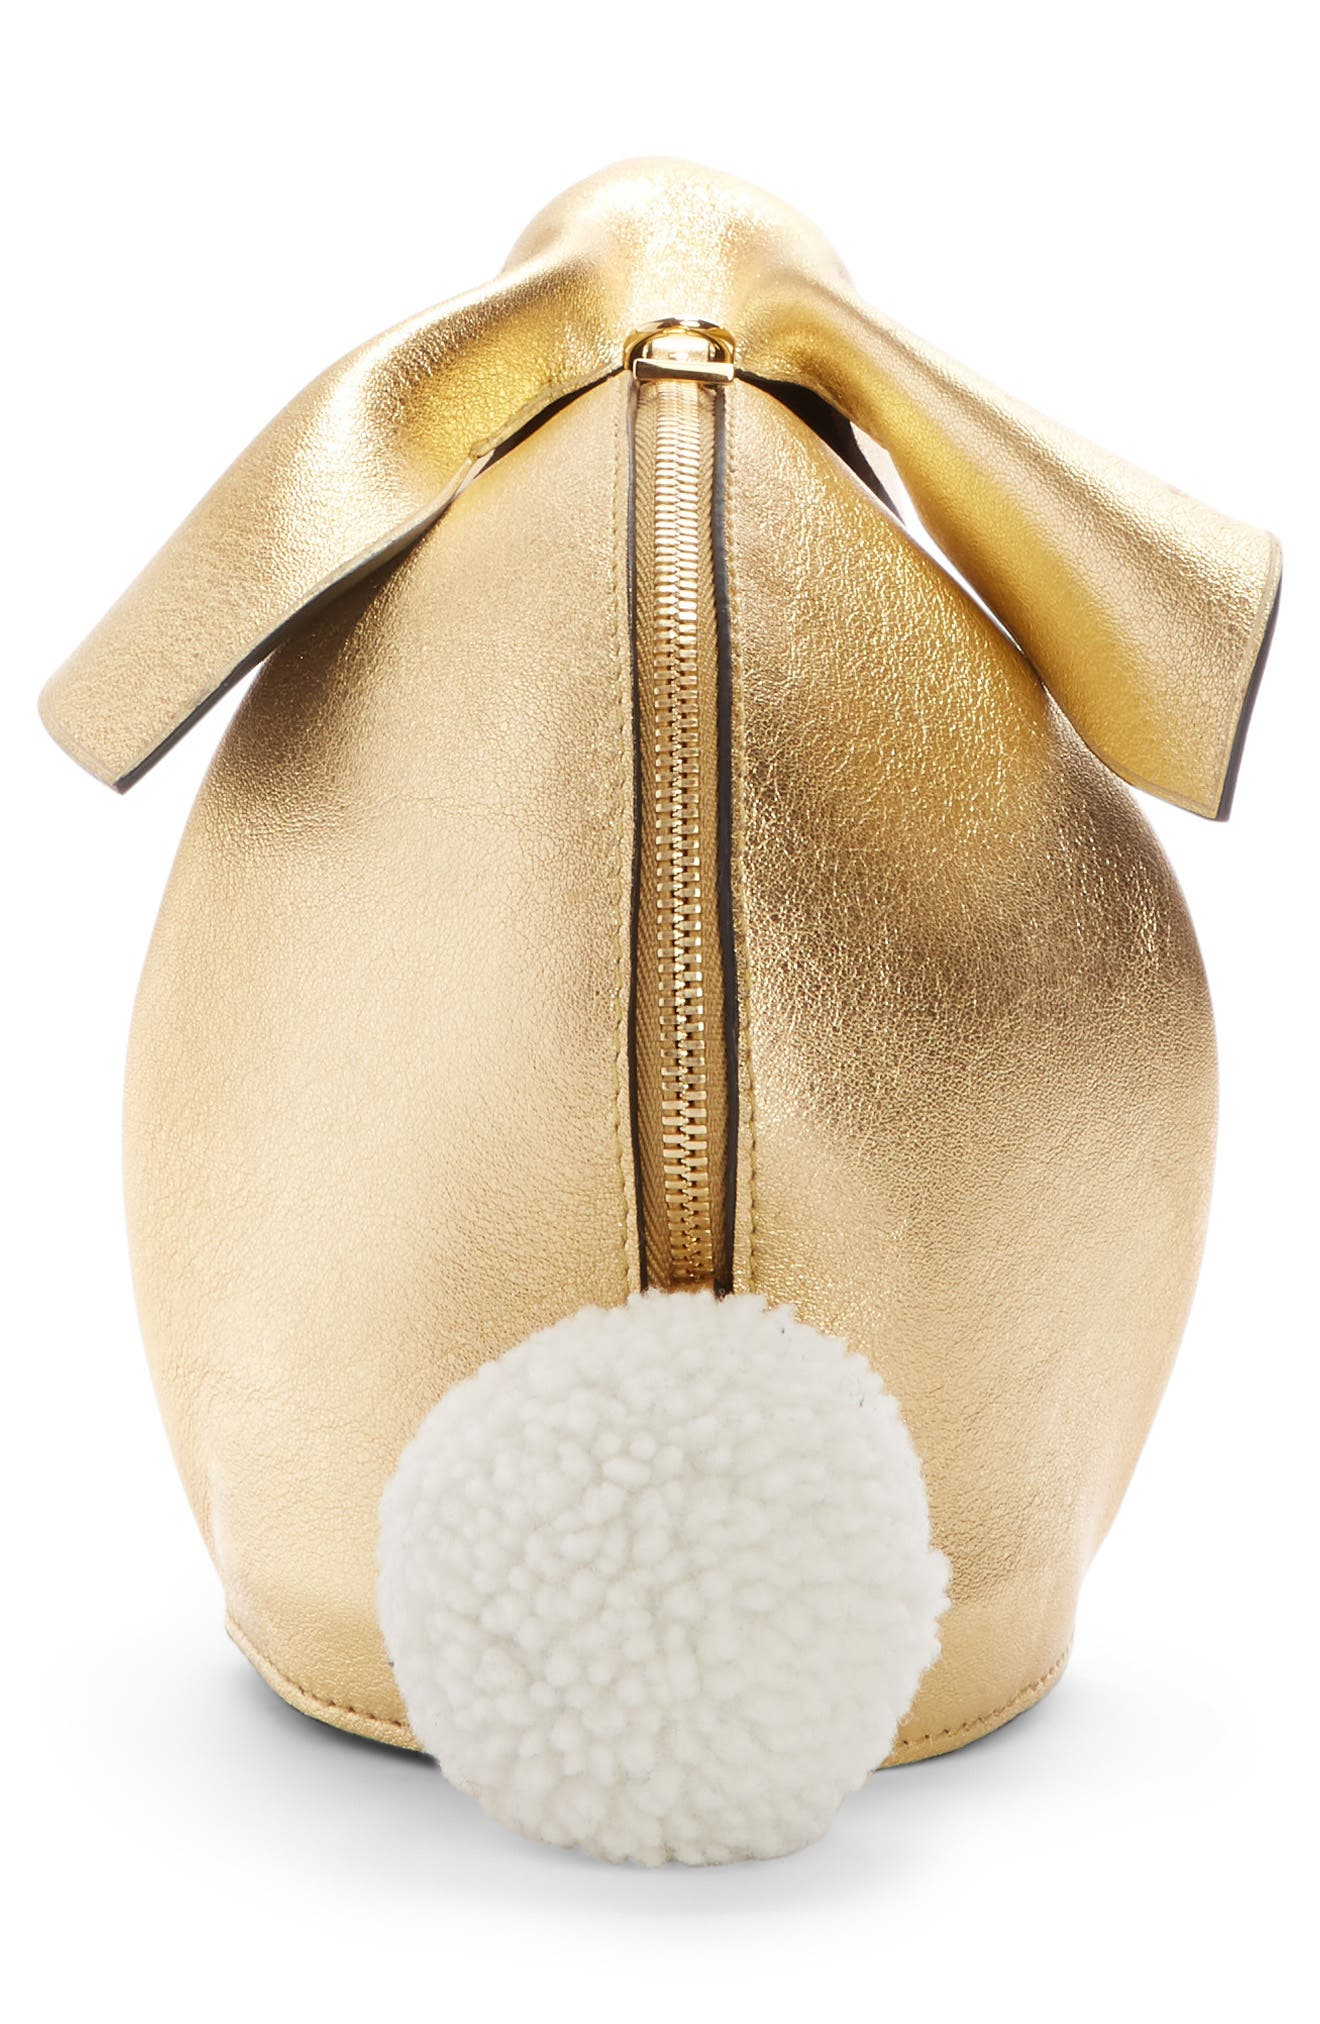 Mini Bunny Metallic Leather Crossbody Bag with Genuine Shearling Trim,                             Alternate thumbnail 3, color,                             710